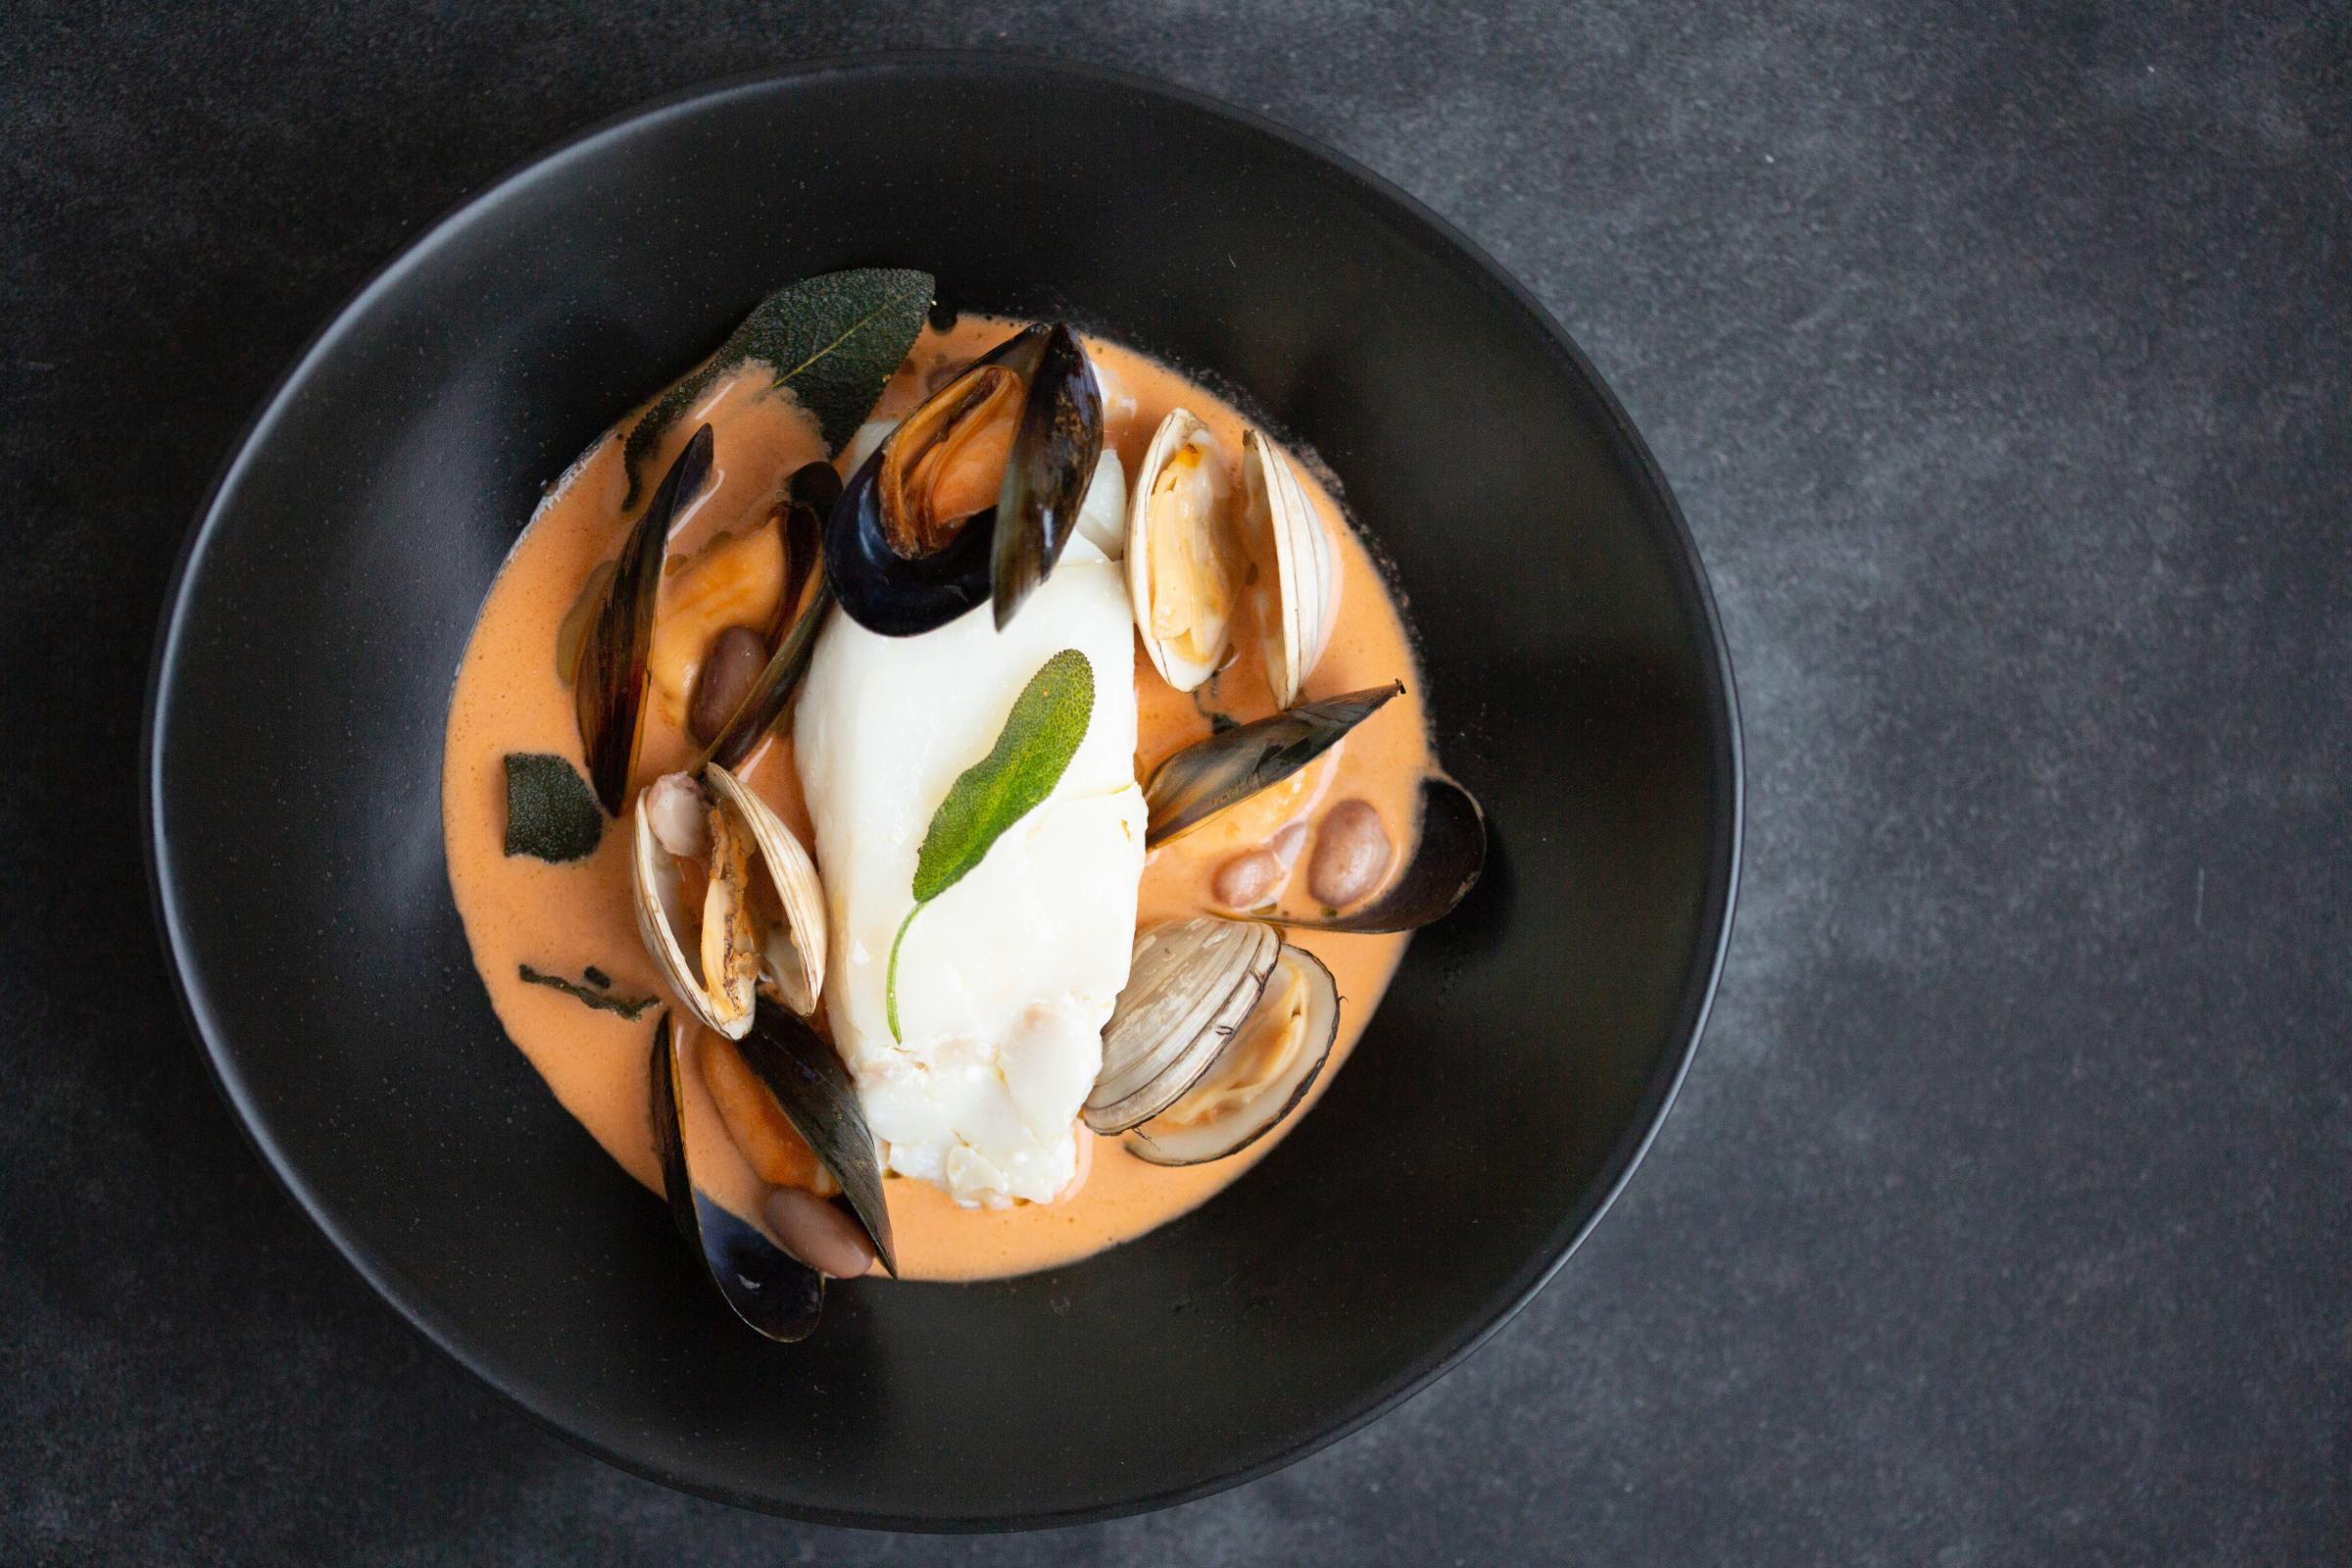 Recipe: Poached Olive Oil Cod and Shellfish Brodo by Giovanna Eusebi of Eusebi Deli